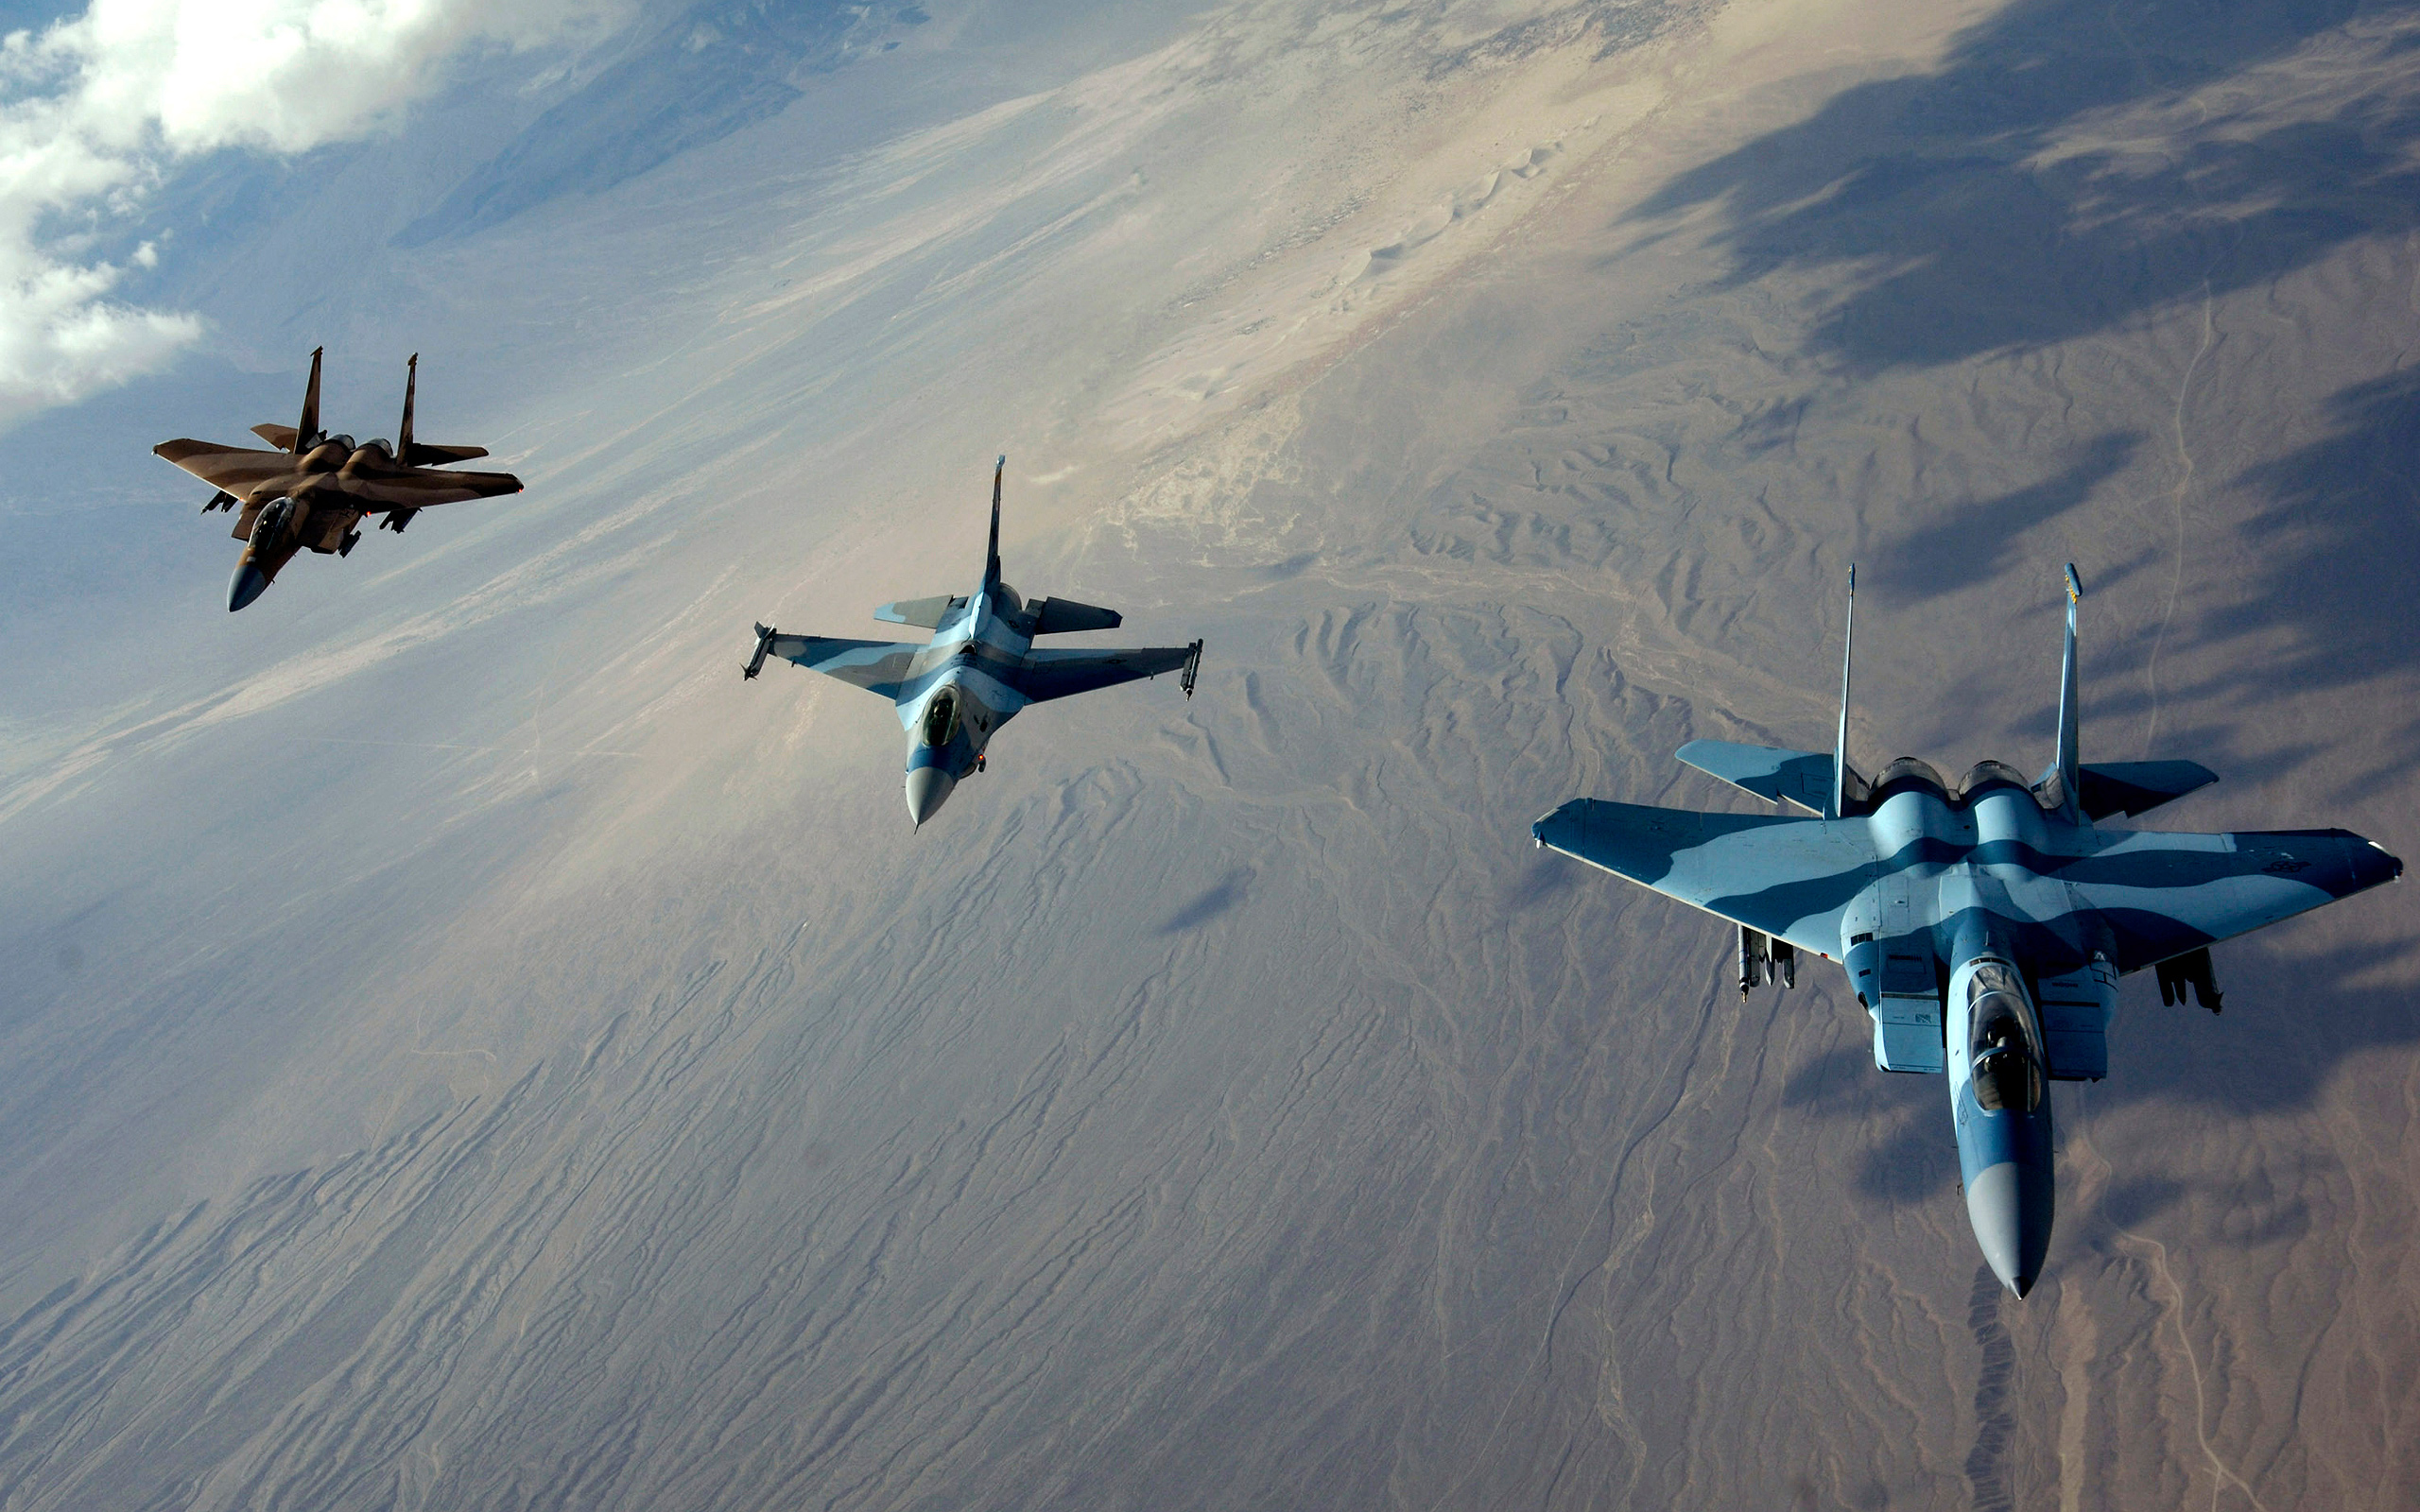 Three Jet Fighter